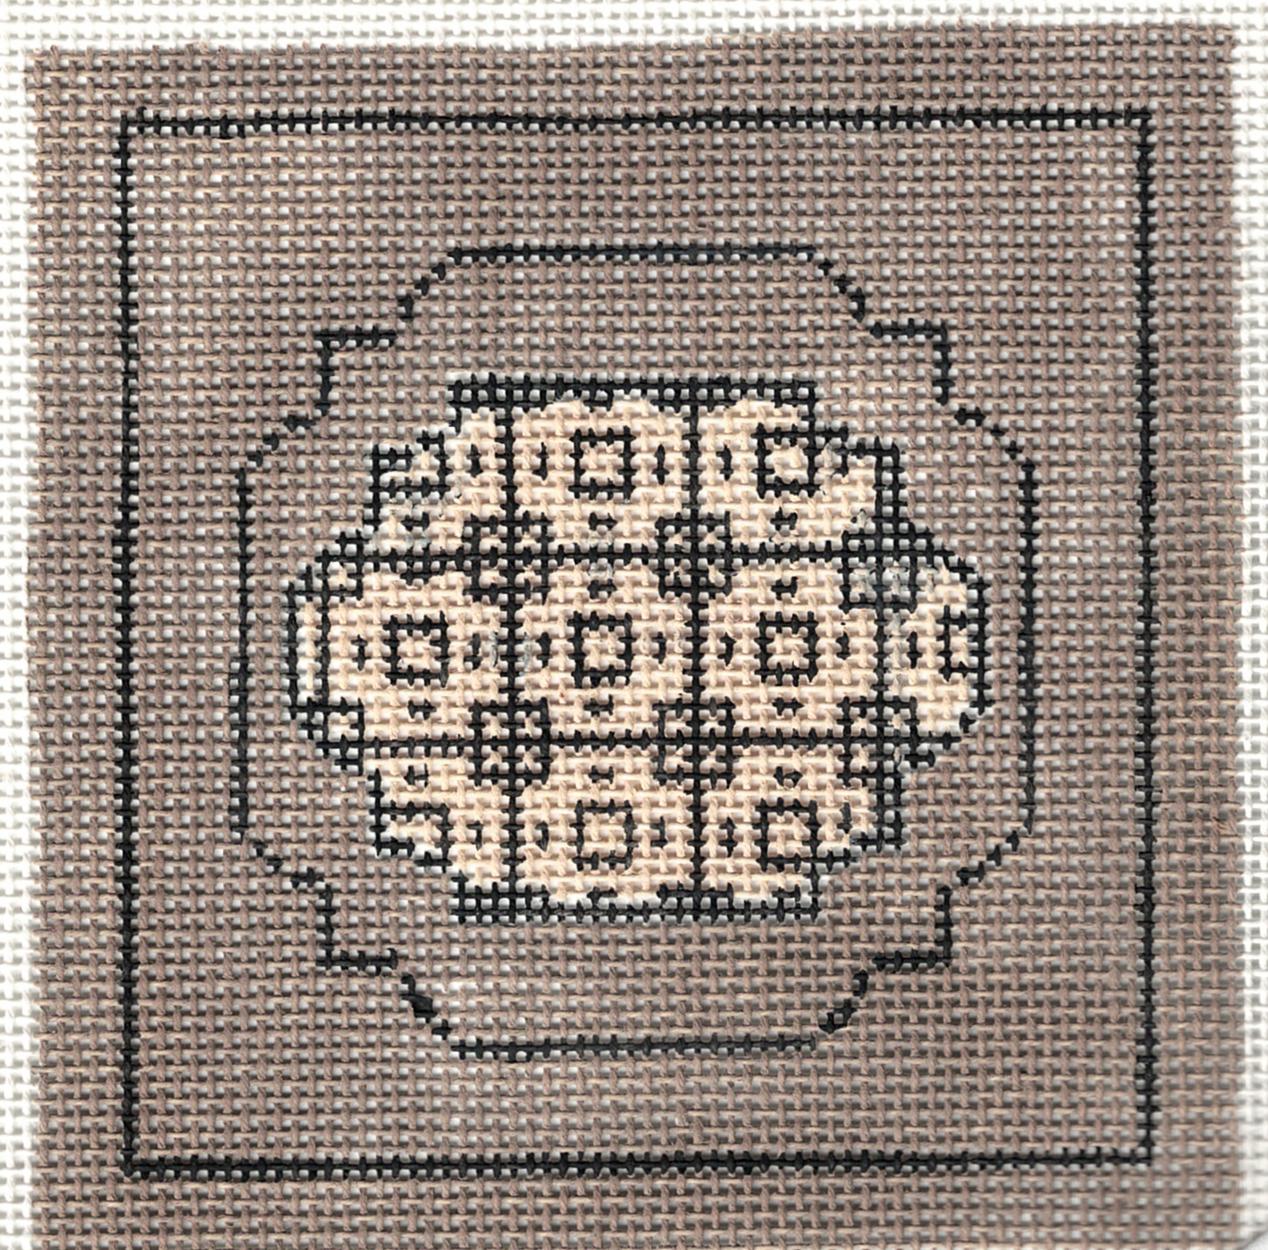 Geometric Double Squares Coaster - 18M